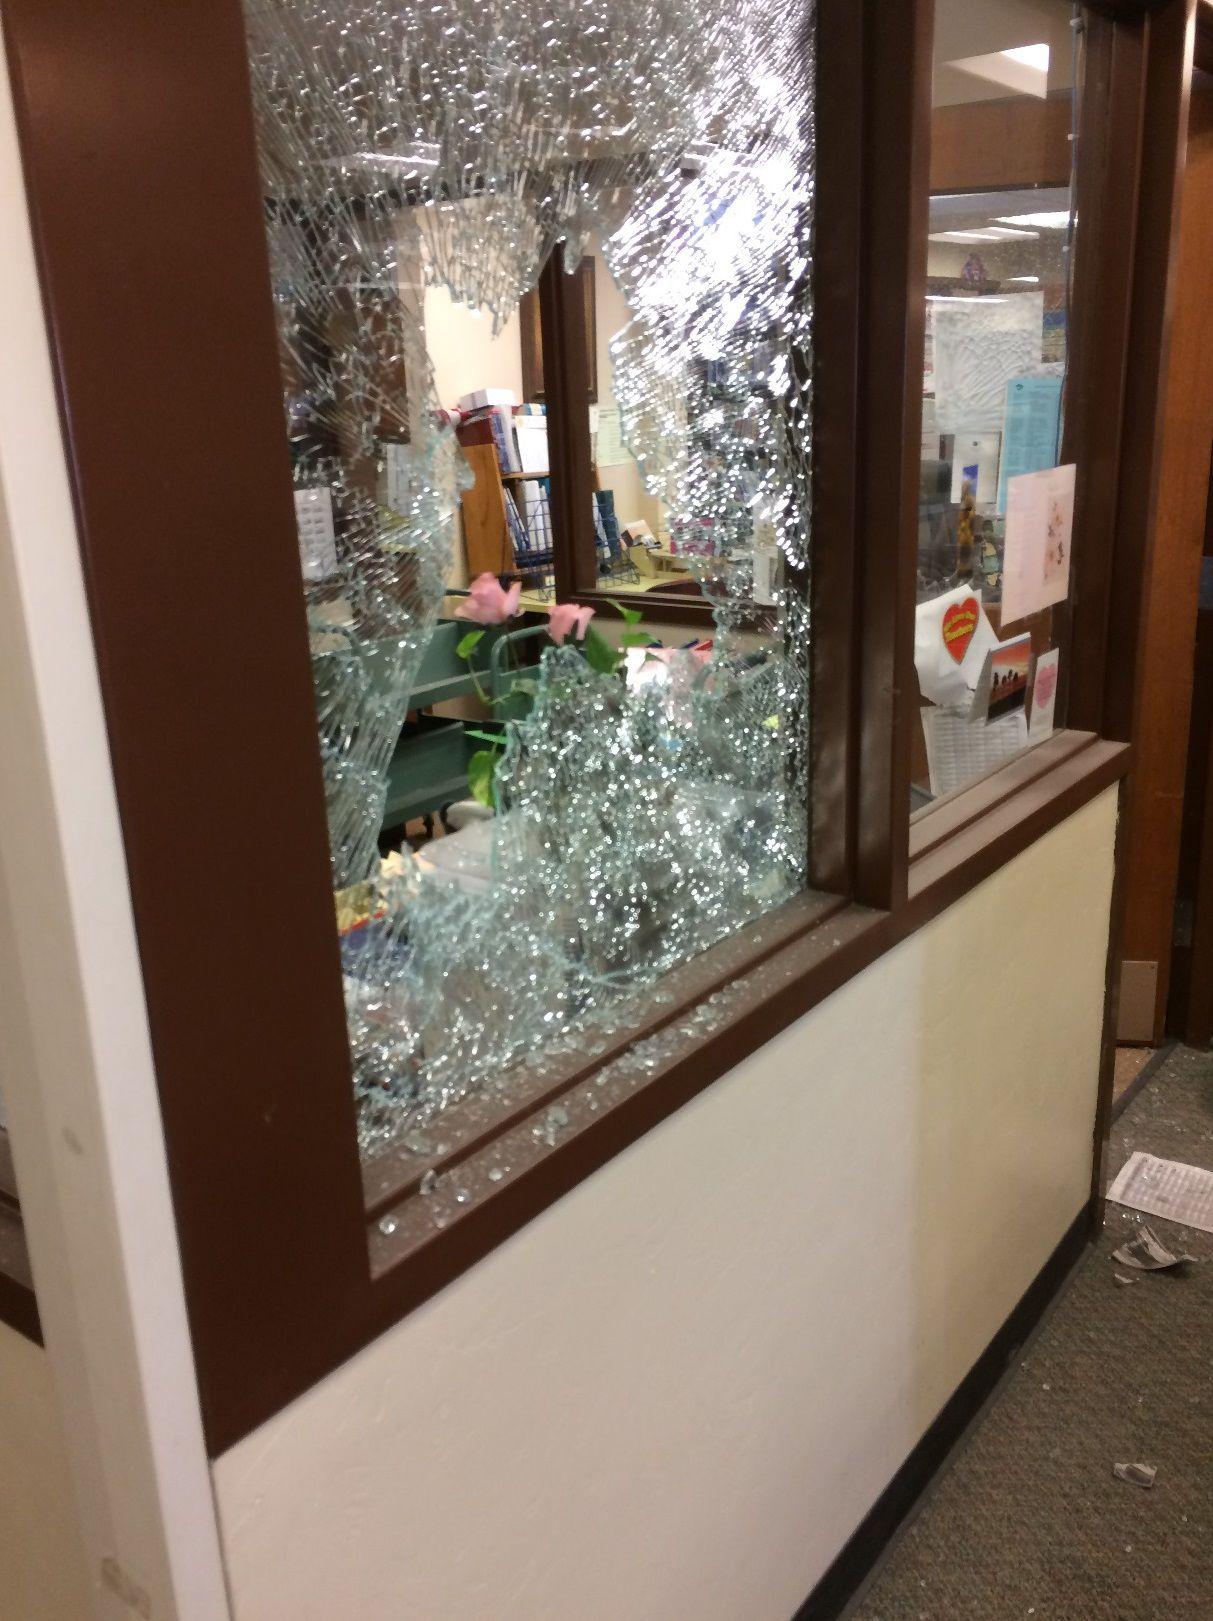 Amphi Schools Vandalized; Library Set Afire, Computers Destroyed   Local  News   Tucson.com